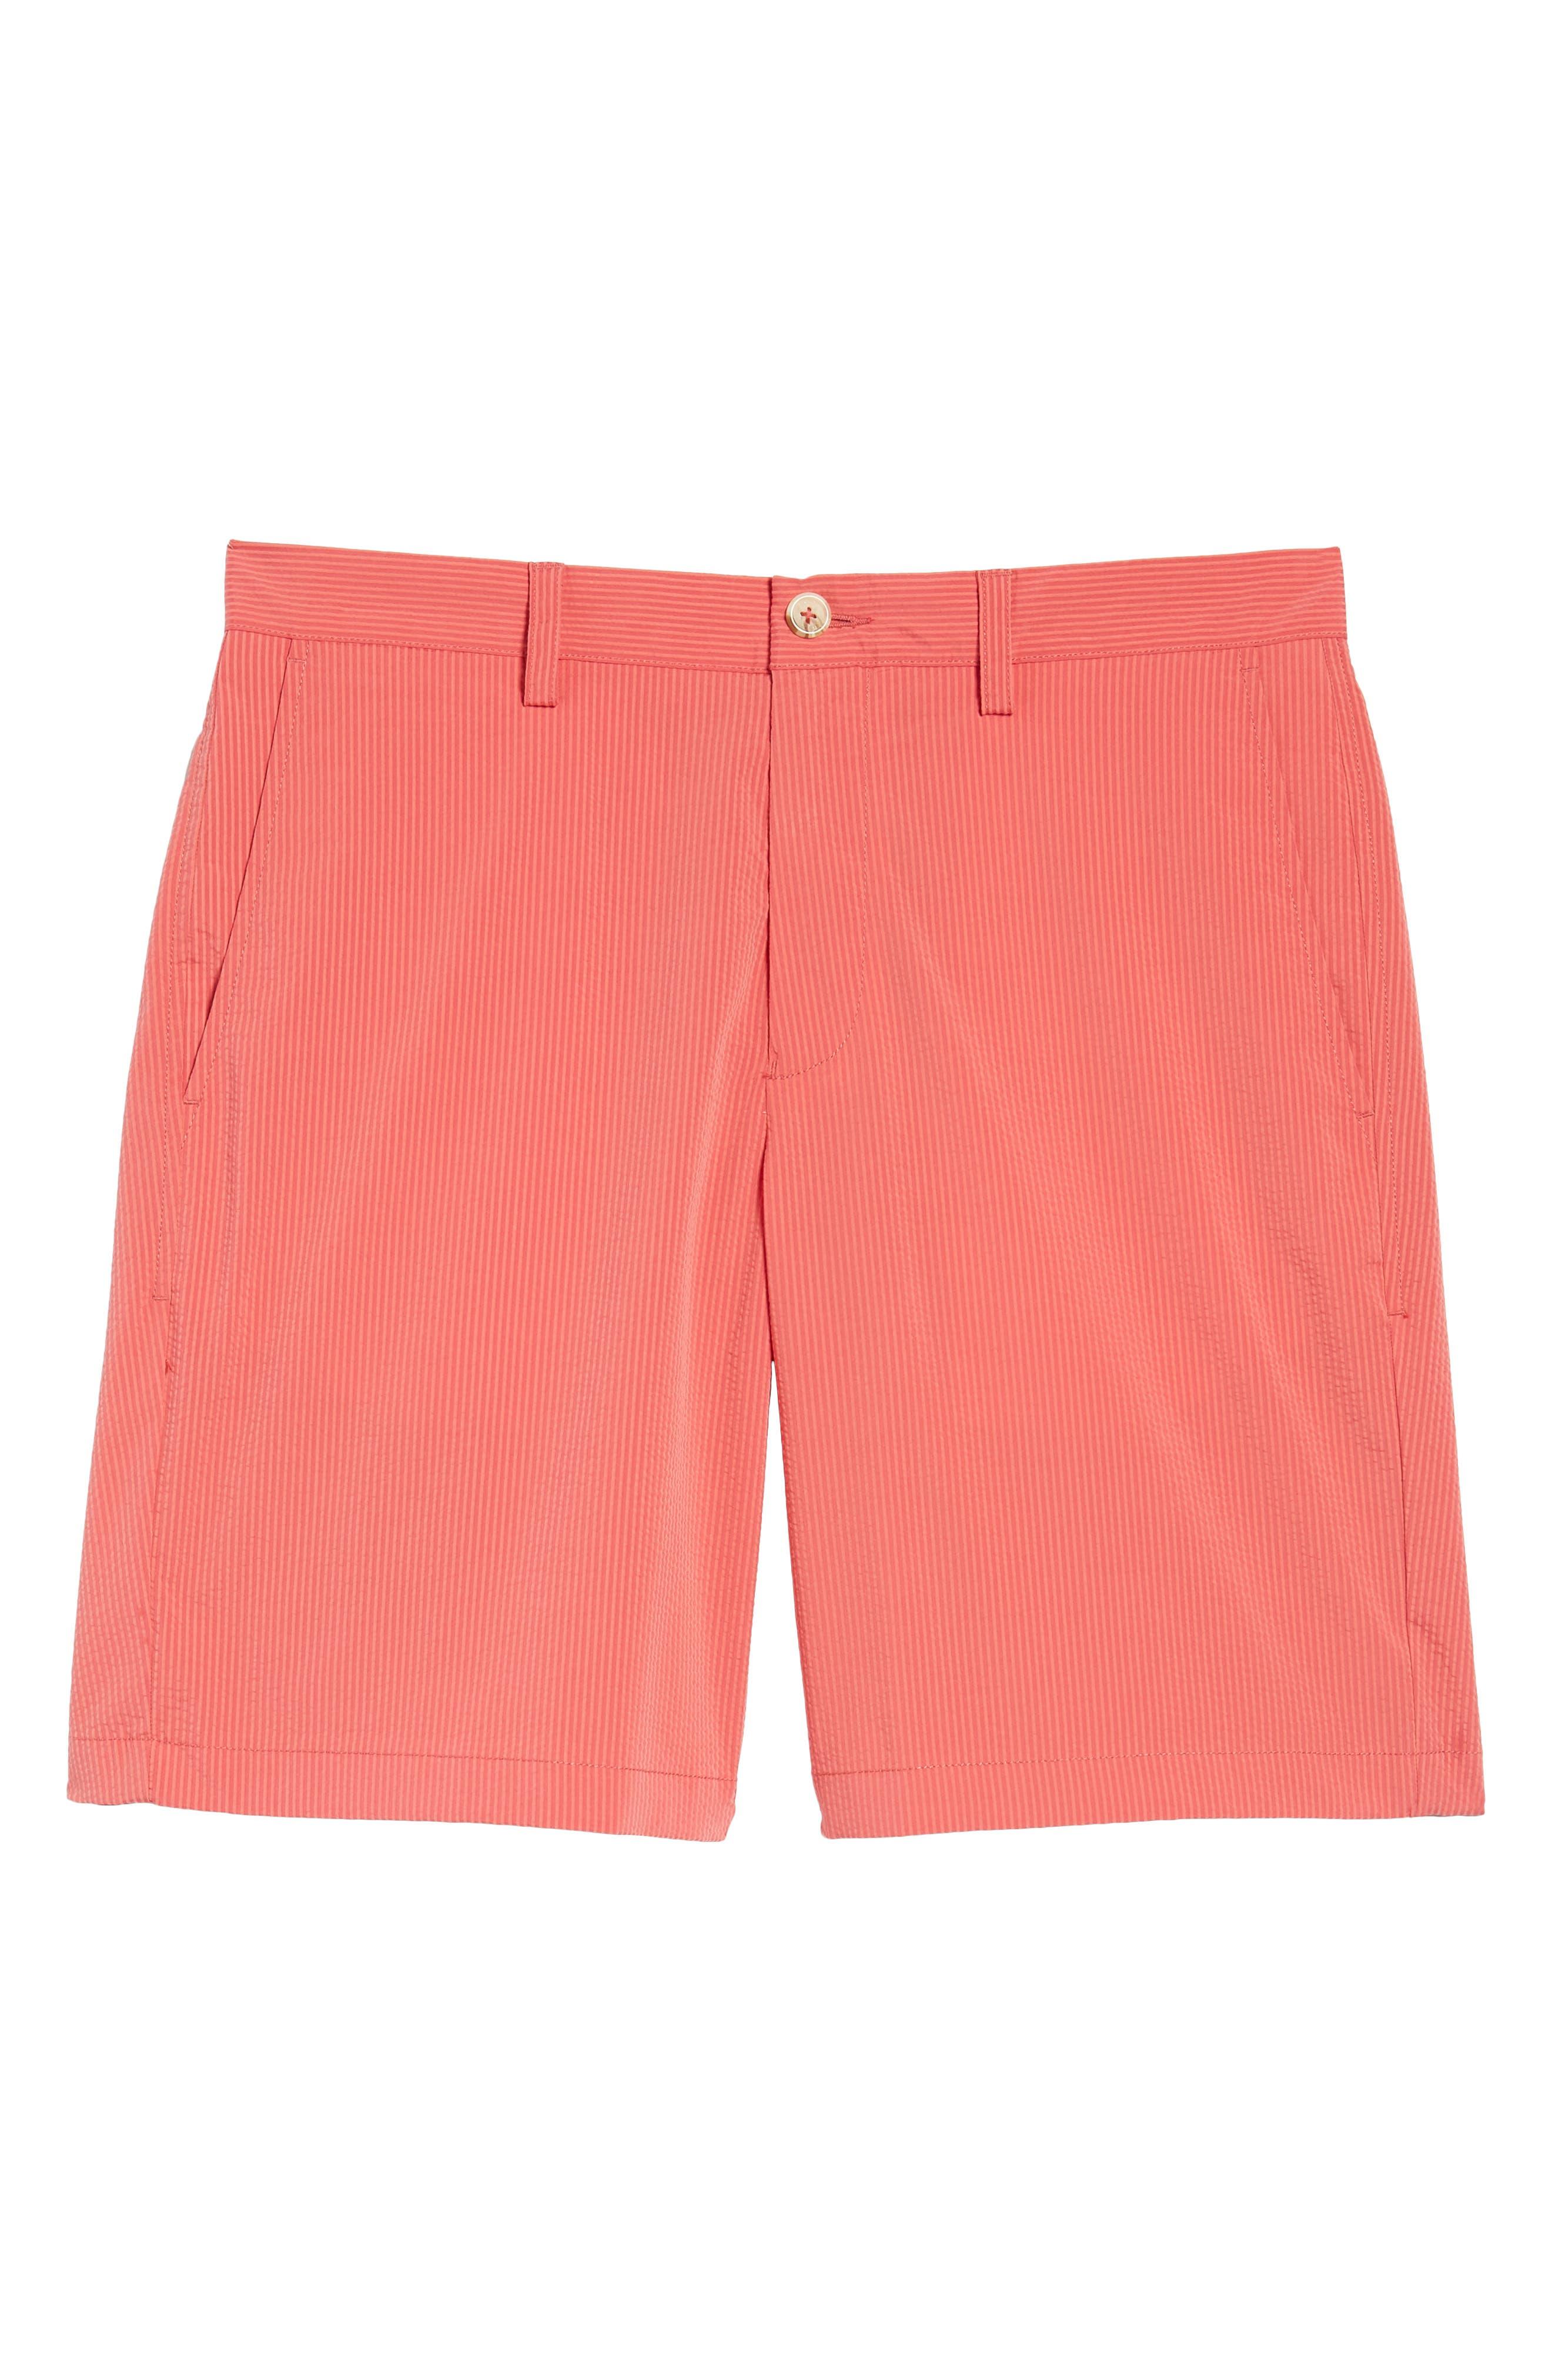 Seersucker Shorts,                             Alternate thumbnail 6, color,                             Charleston Red